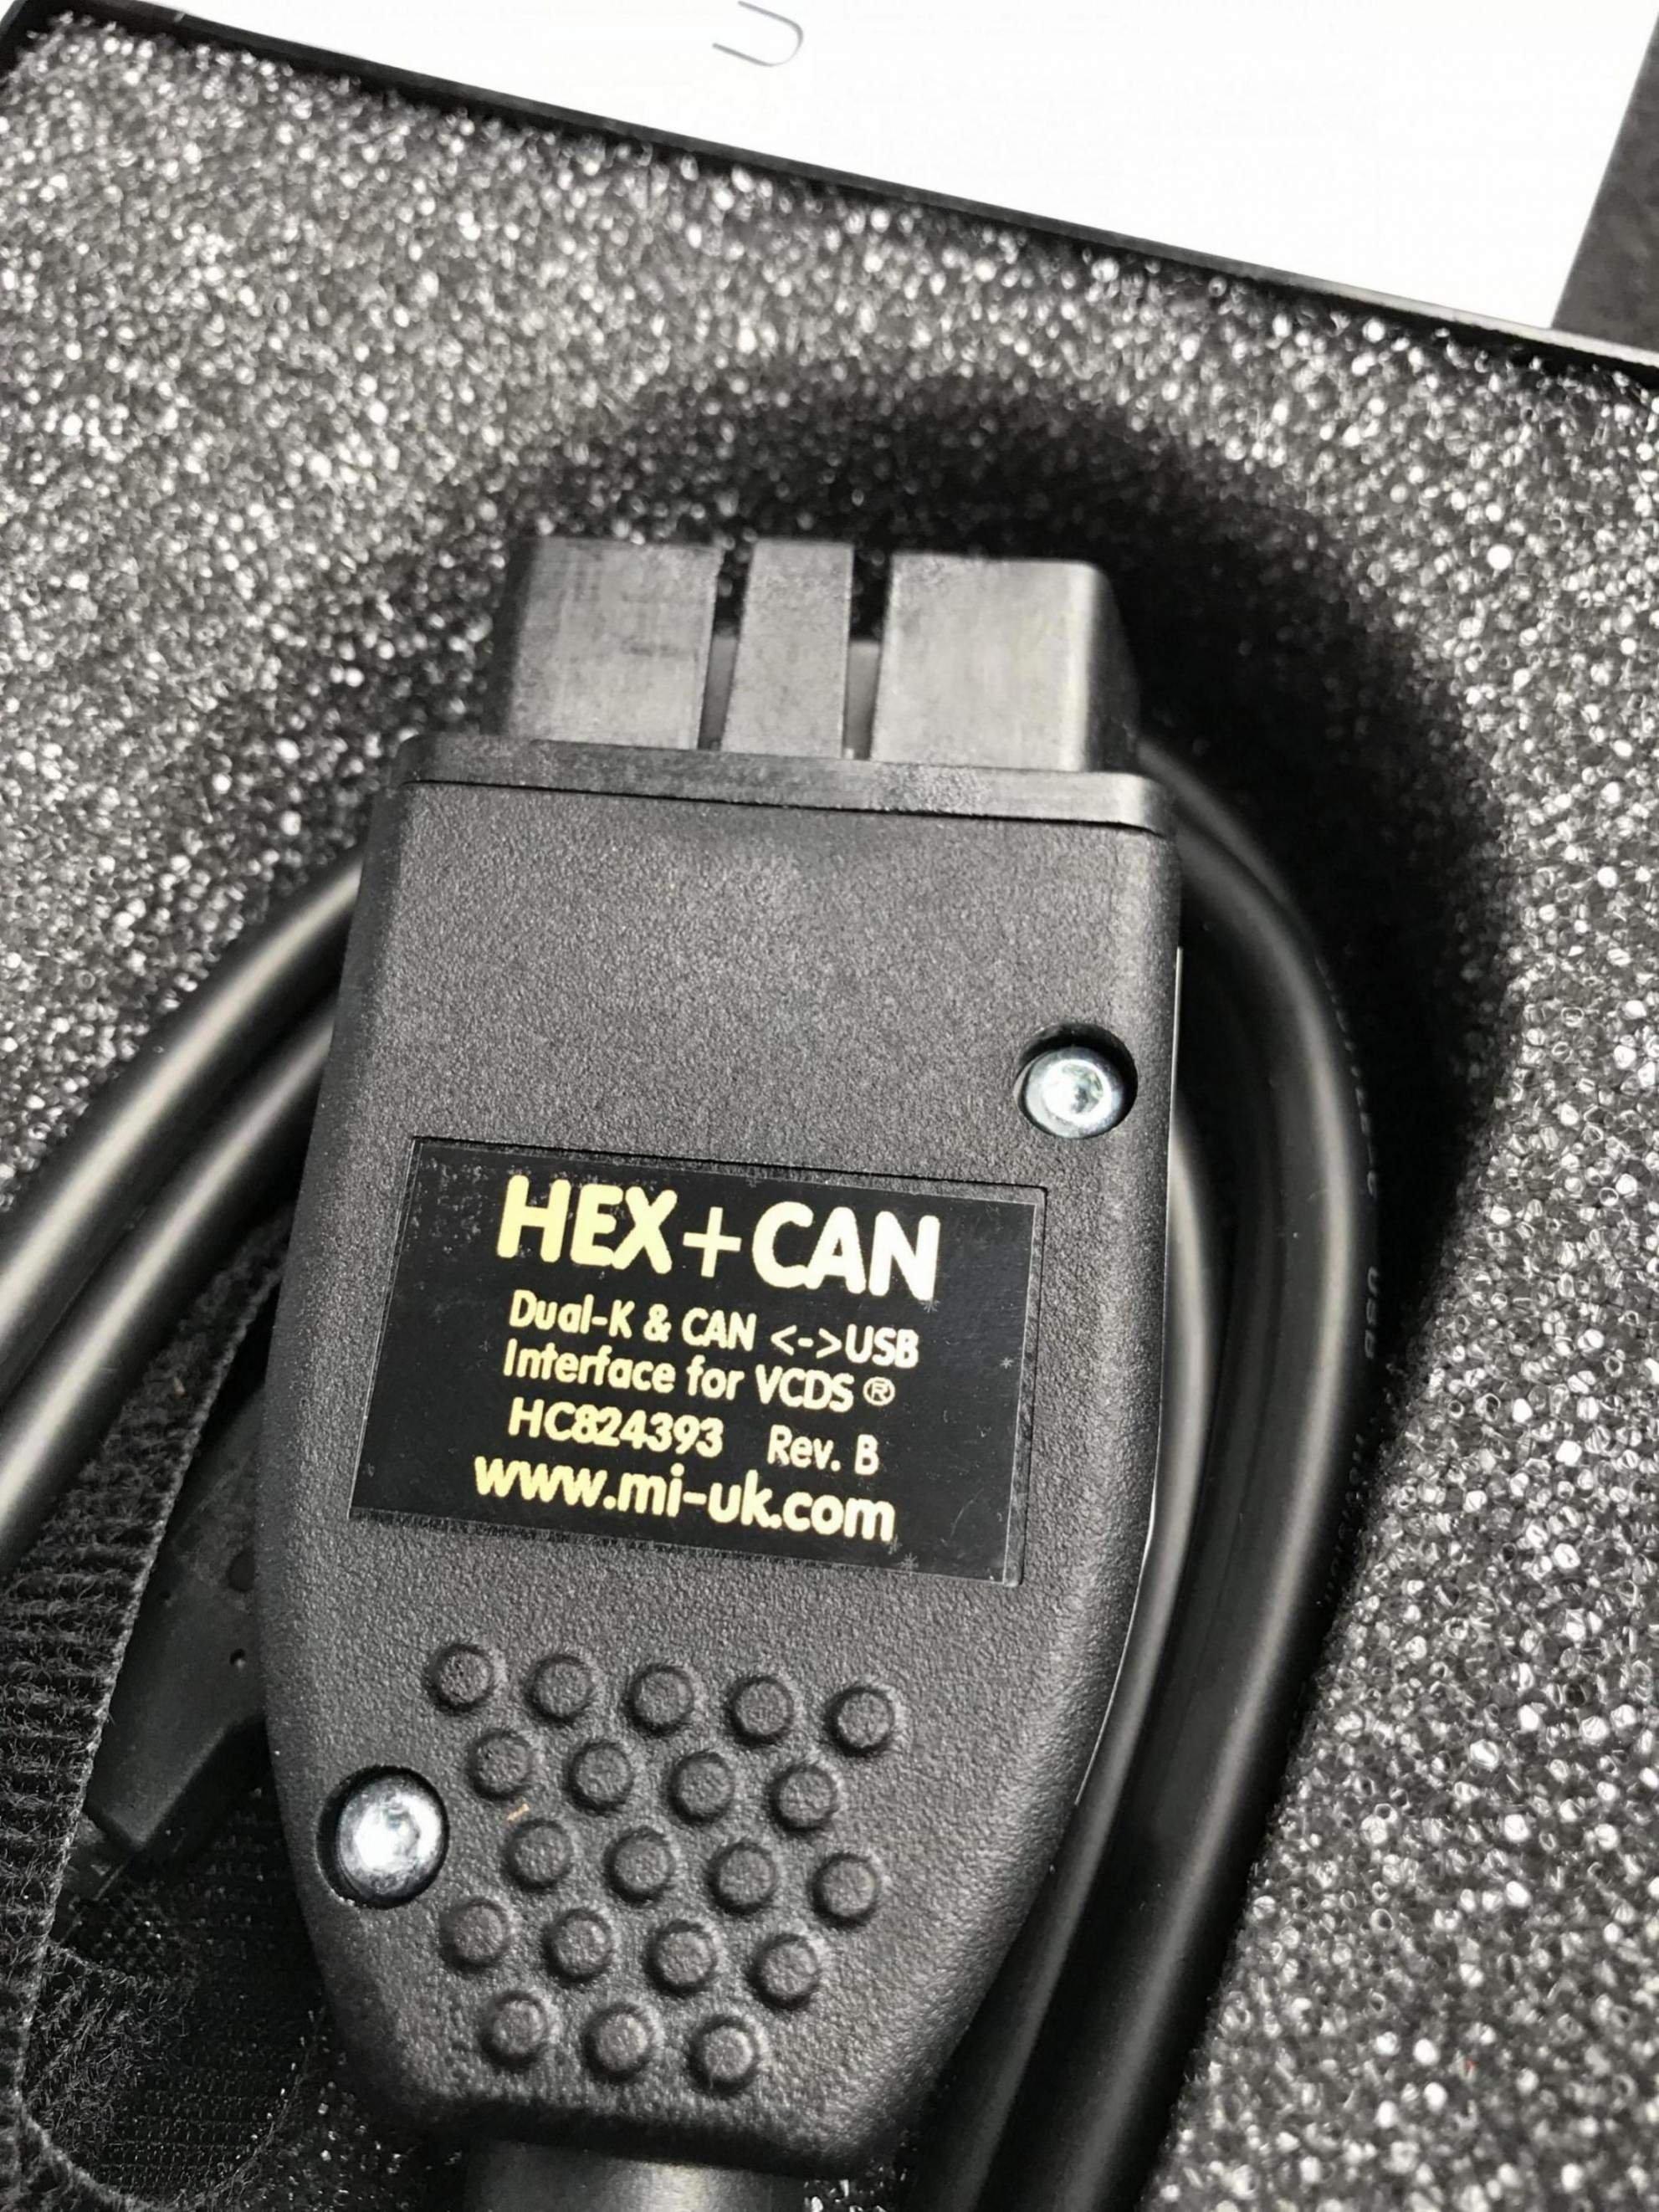 FS: Genuine Ross-Tech VAG-COM HEX+CAN USB | Audi A5 Forum & Audi S5